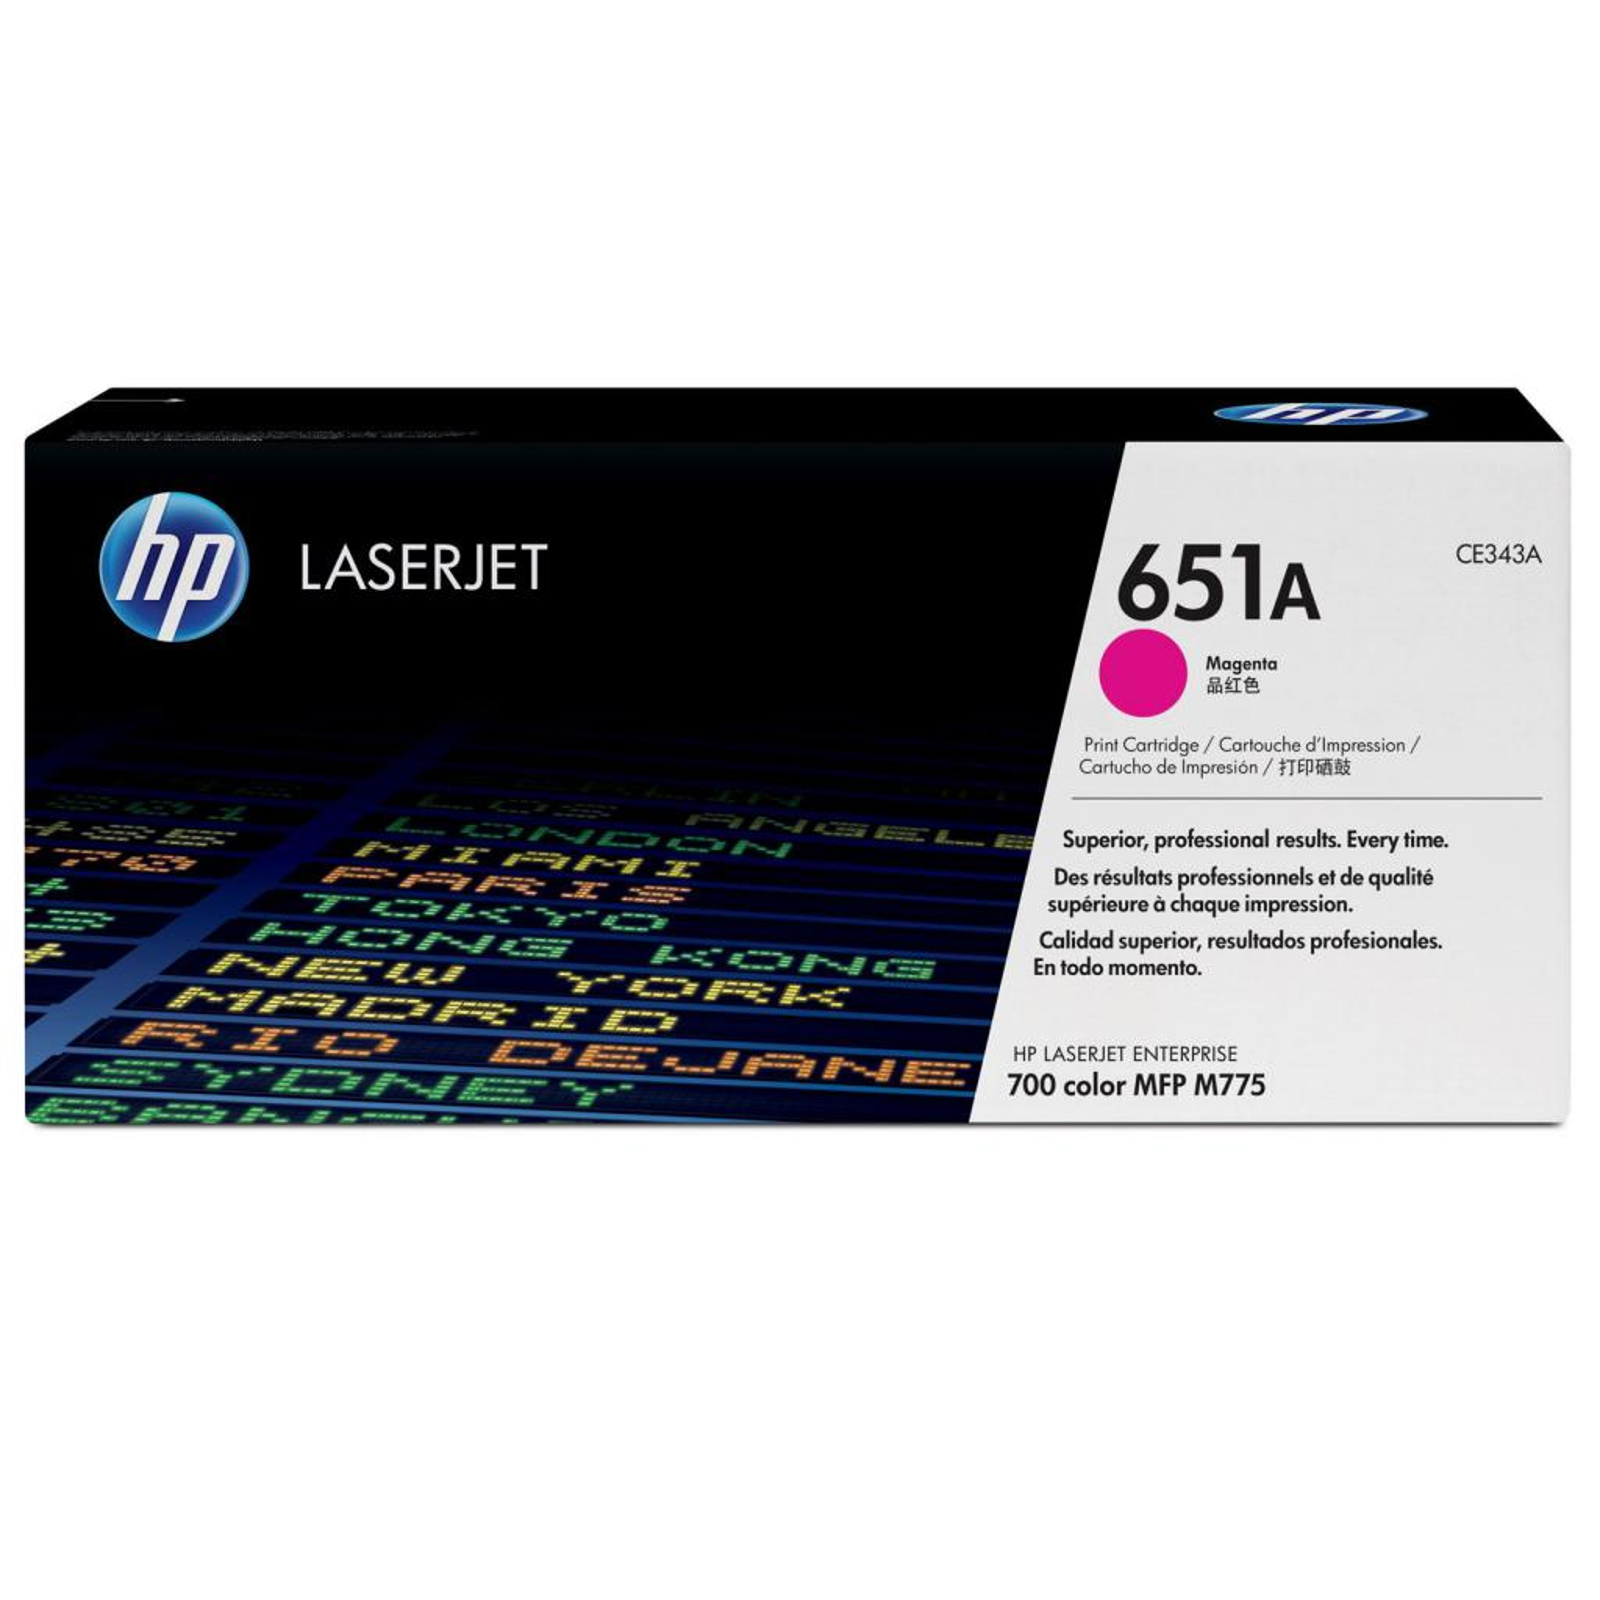 Картридж HP CLJ 651A Magenta (M775dn/M775f/M775z/M775z+) (CE343A)